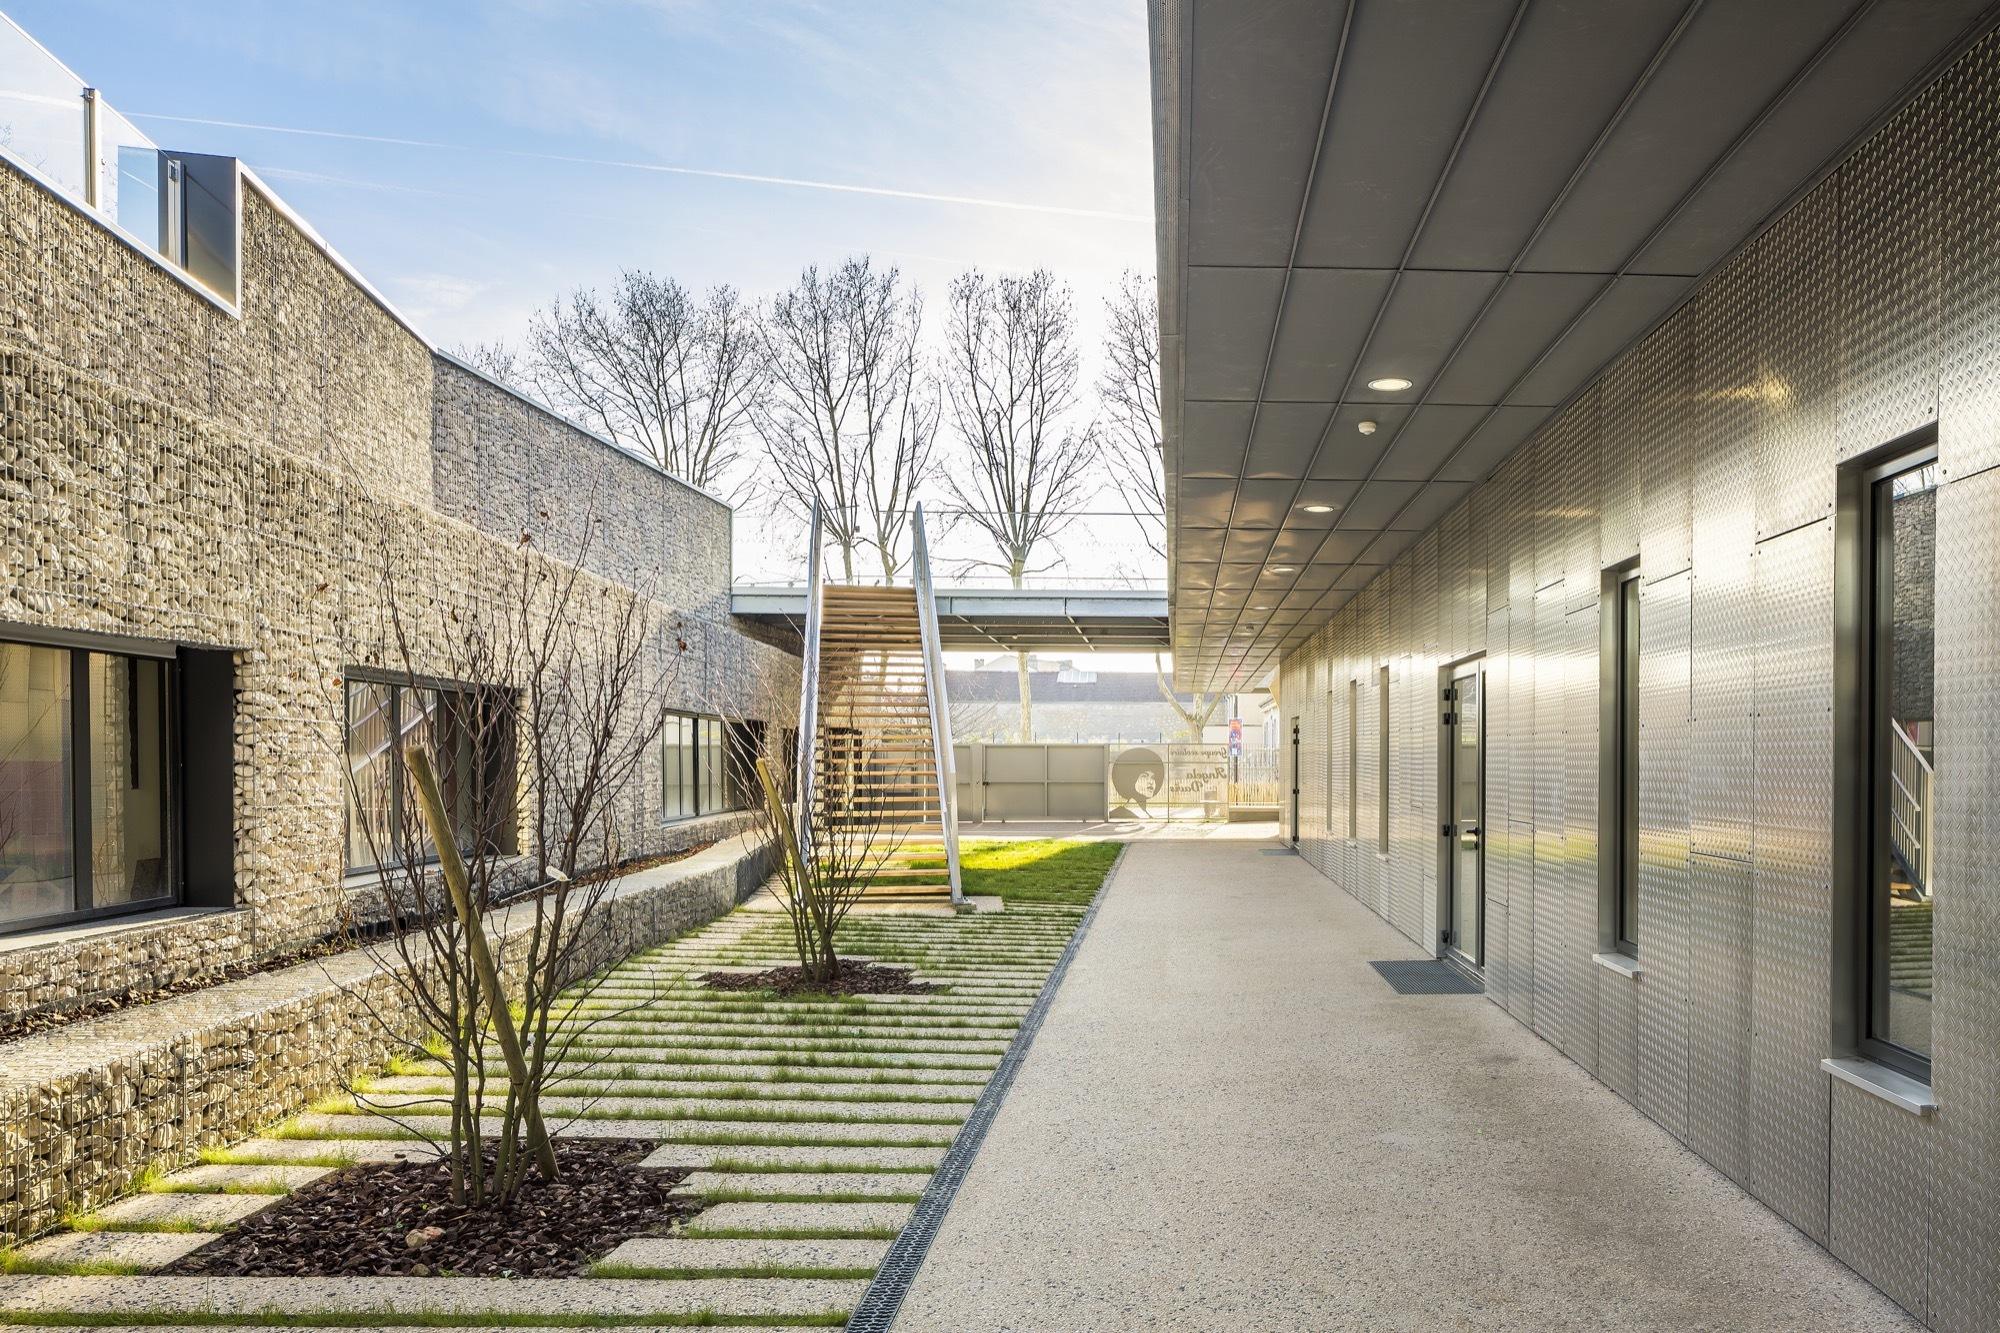 Galer a de escuela bezons angela davis archi5 tecnova for Arquitectura de interiores universidades